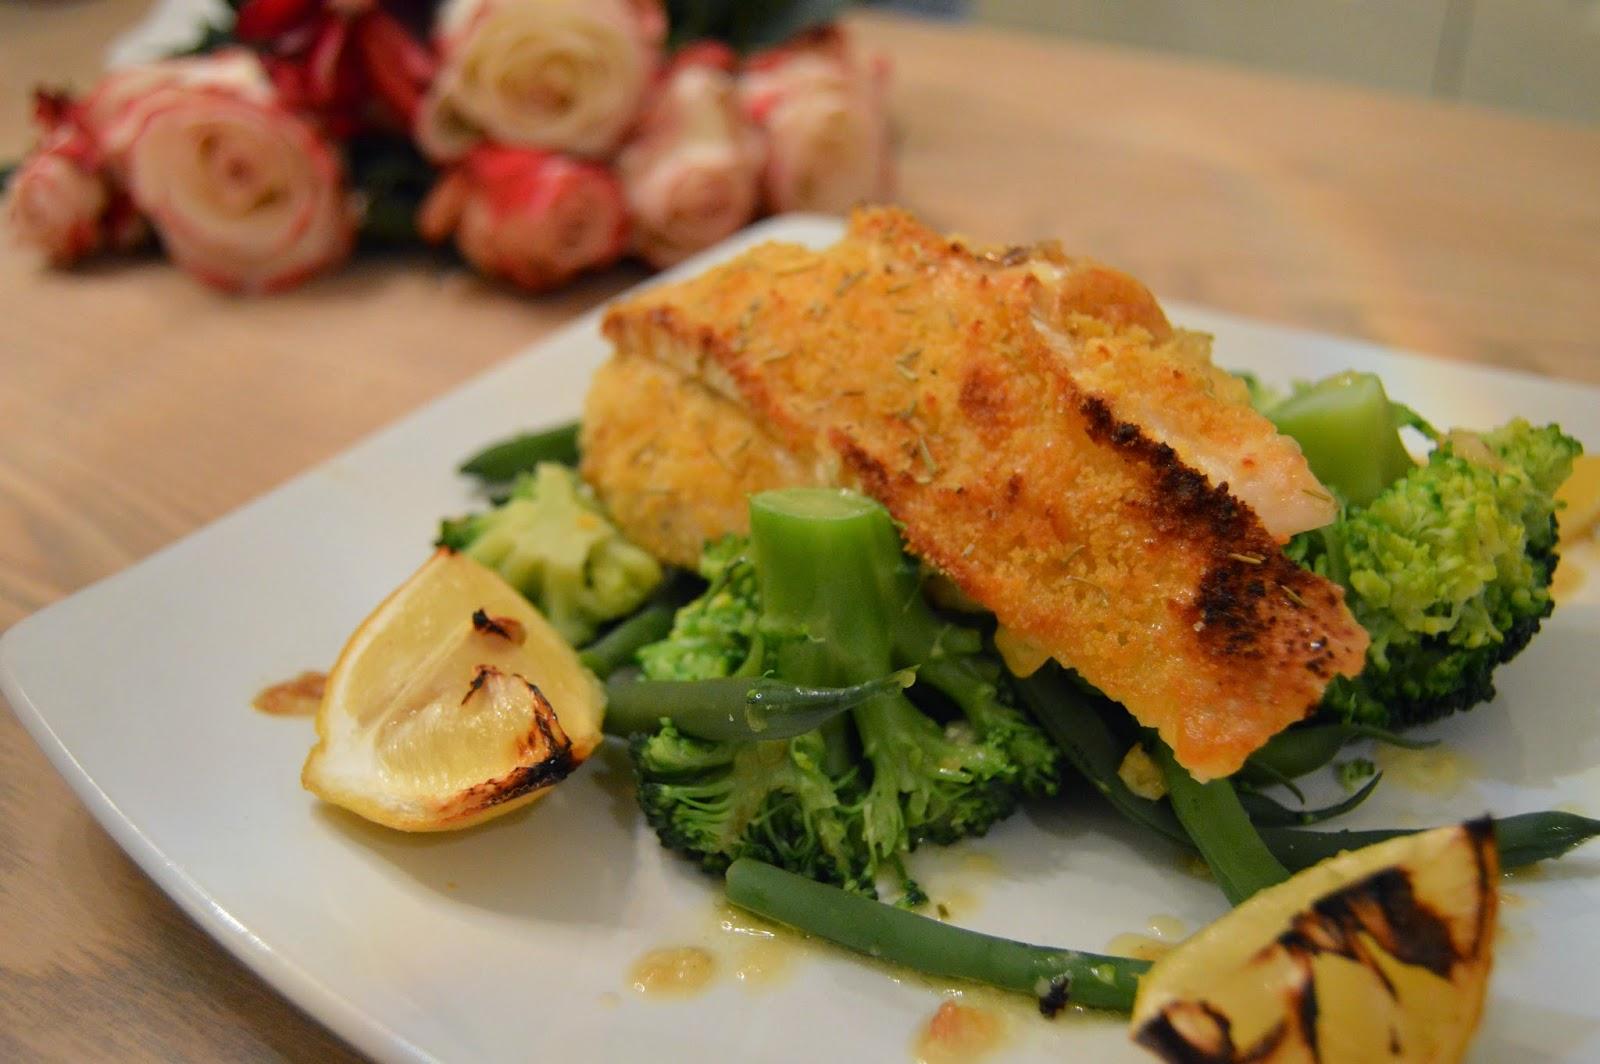 Recipe: Breaded Chicken with Brie